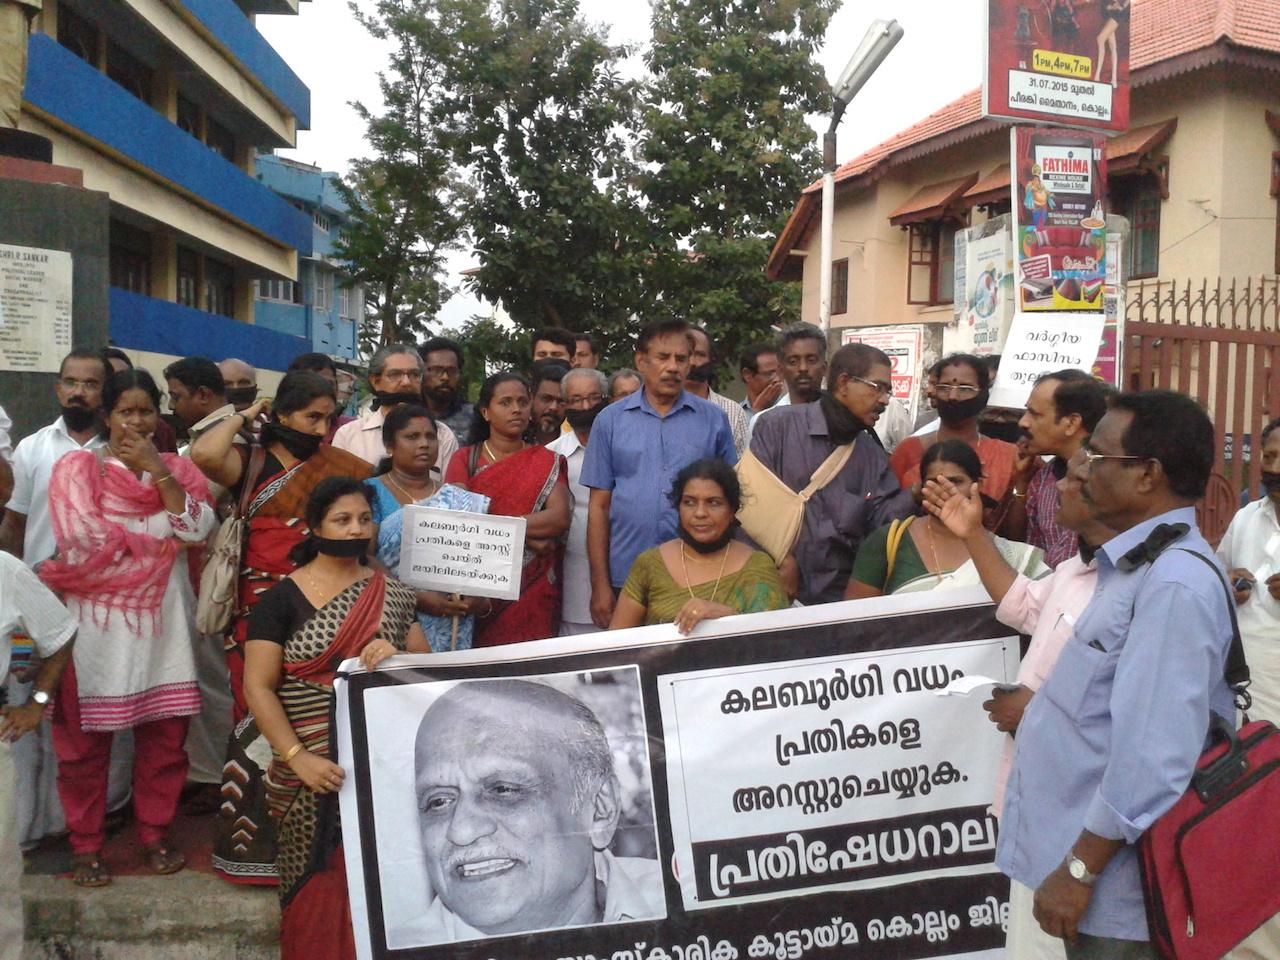 A protest against the murder of M. M. Kalburgi murder in Kollam on September 3 (photo by Fotokannan, via Wikimedia Commons)